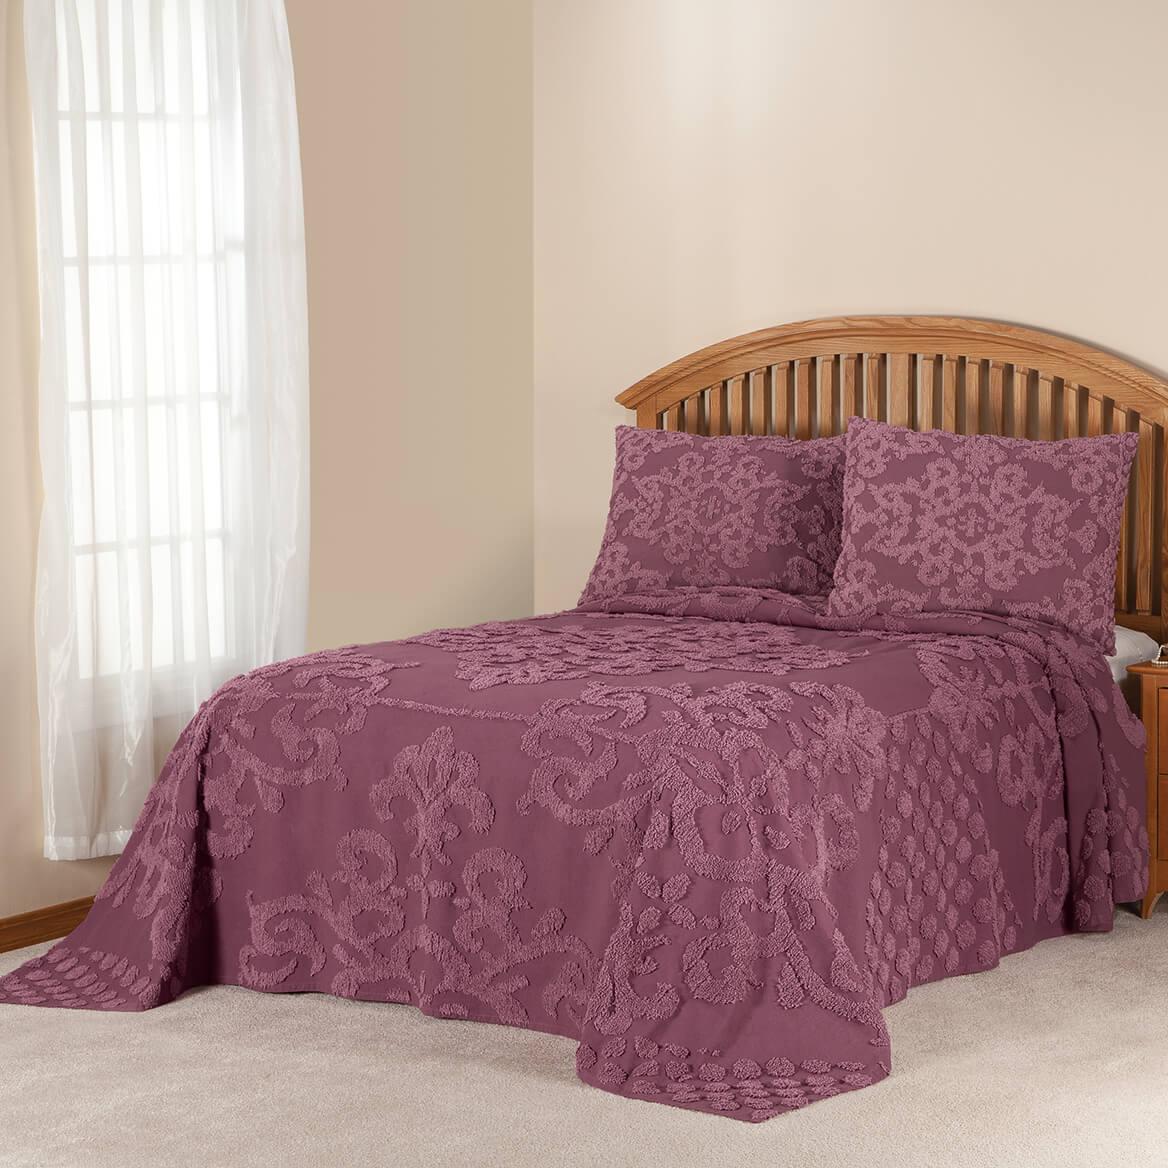 The-Florence-Chenille-Bedspread-by-OakRidgeTM thumbnail 7